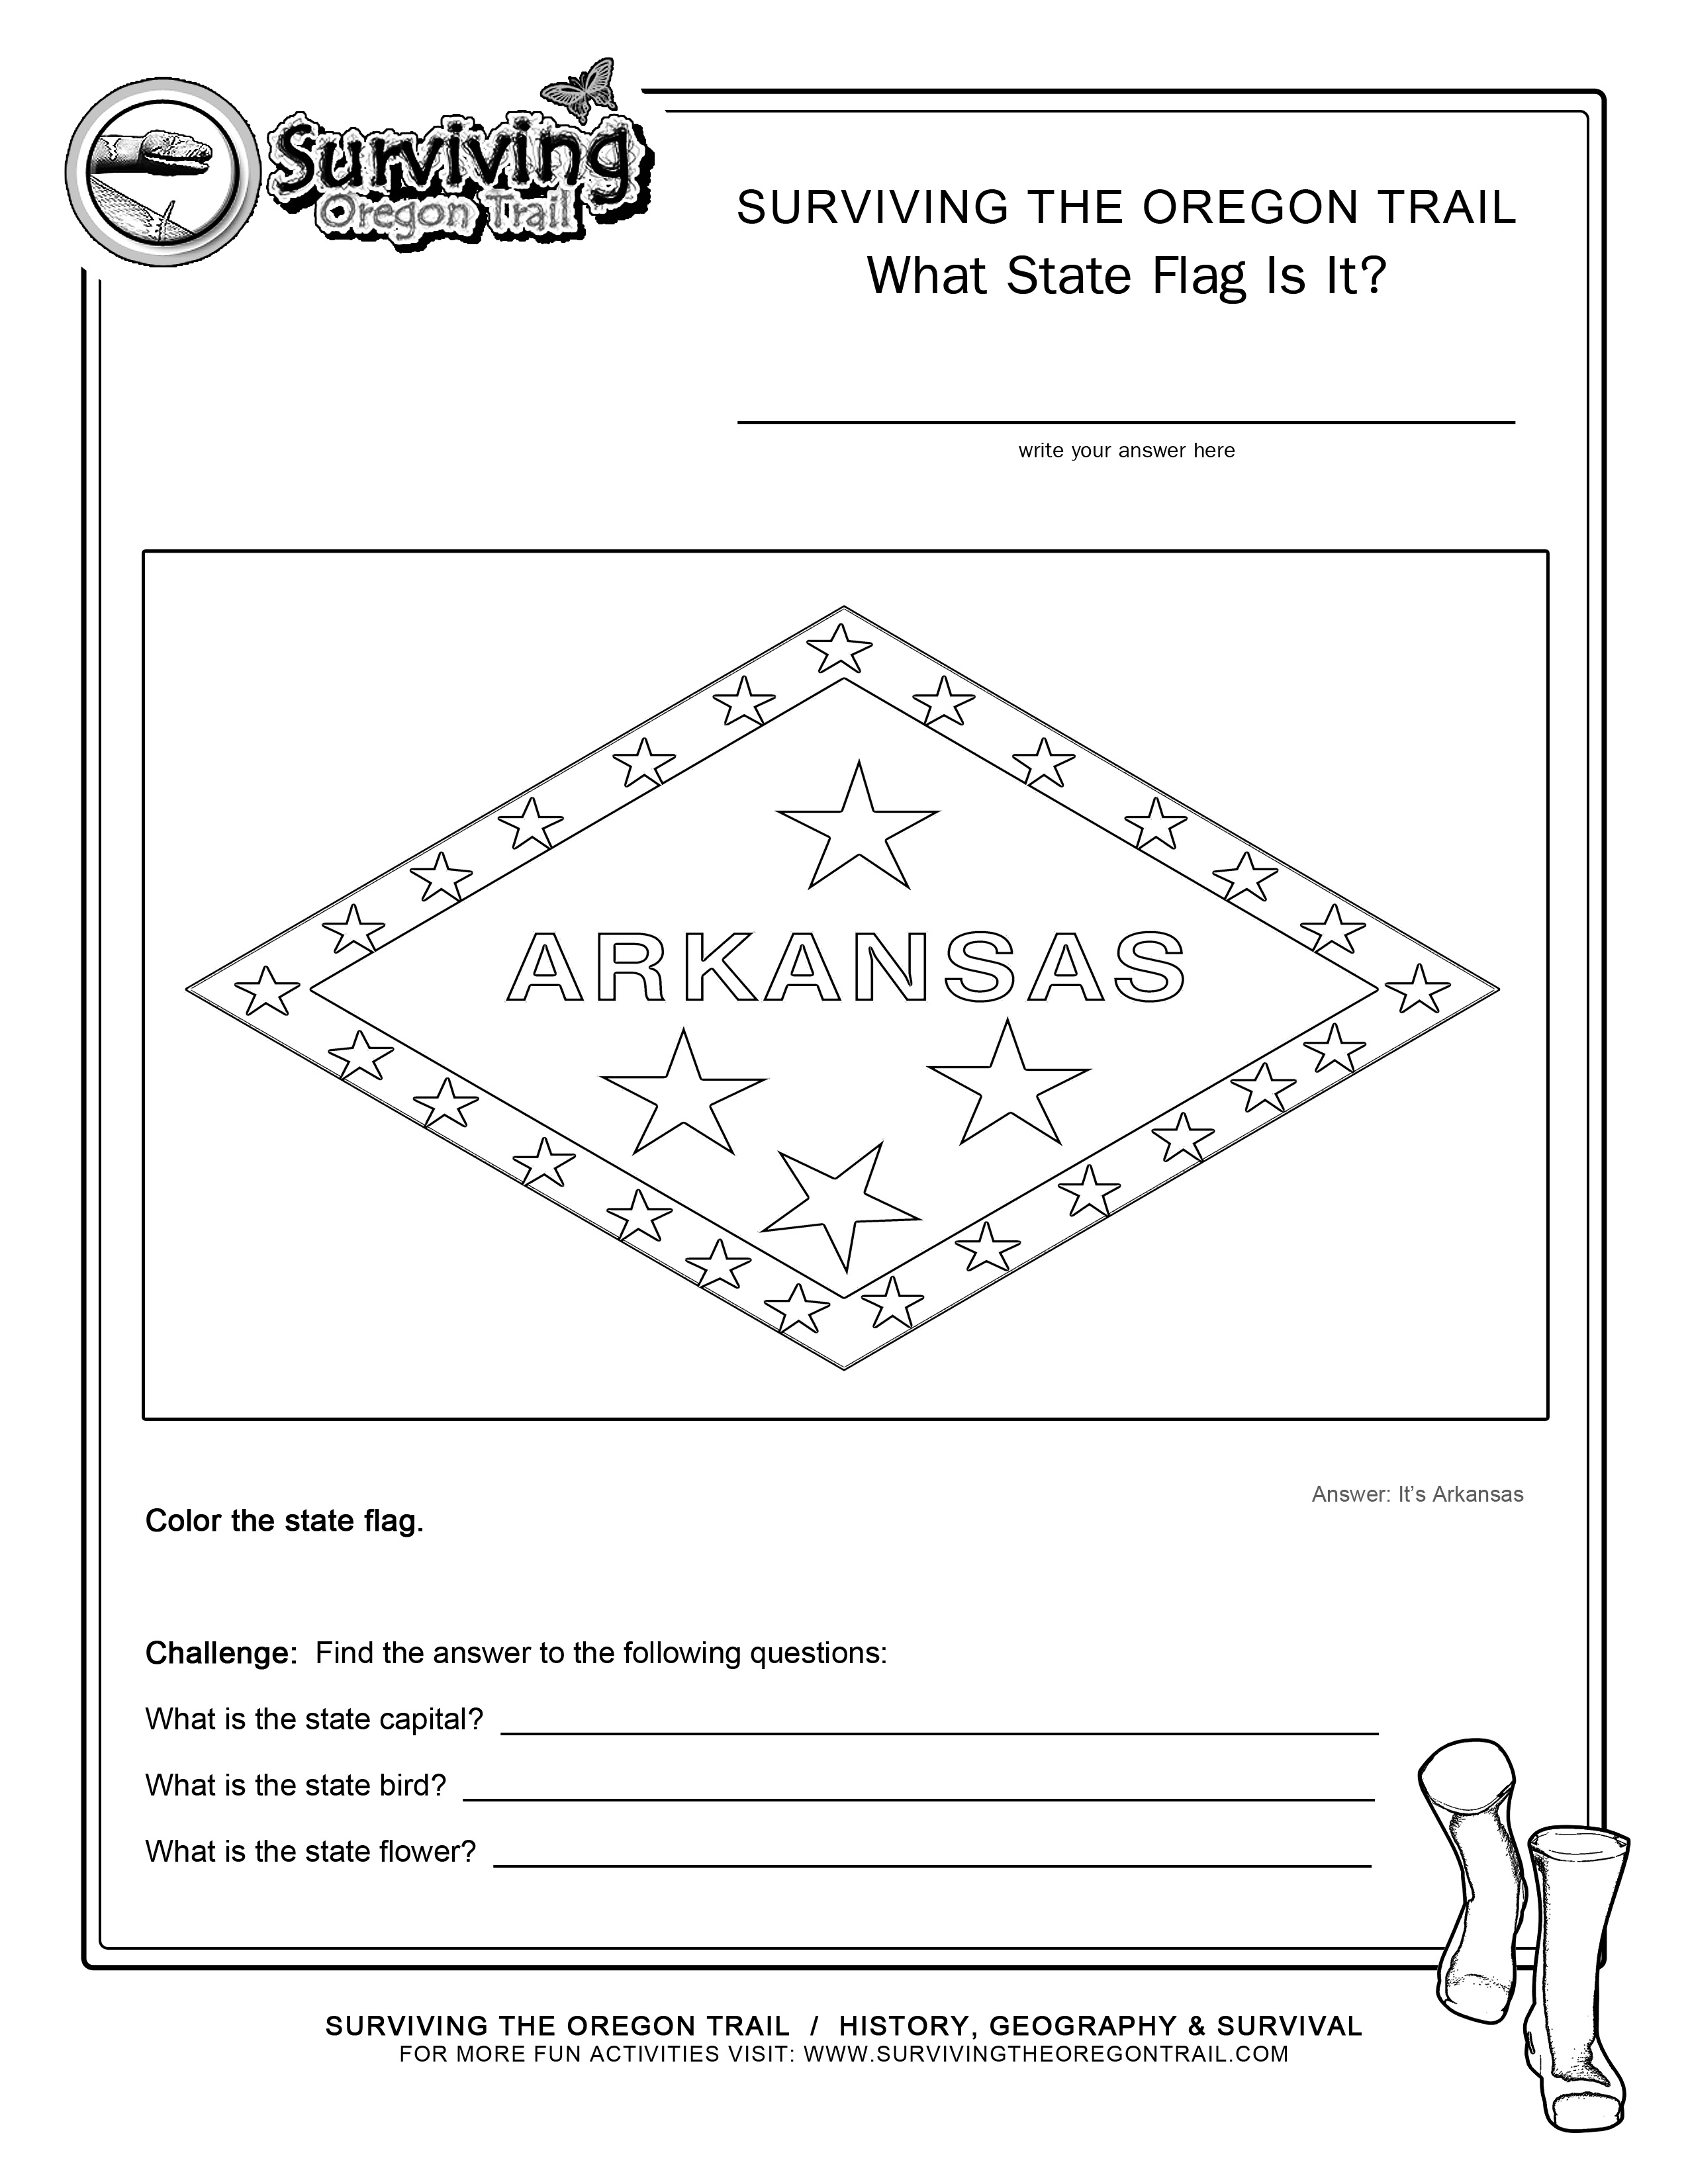 Coloring Page State Flag Arkansas Printable Worksheet – Surviving - Free Printable Arkansas History Worksheets